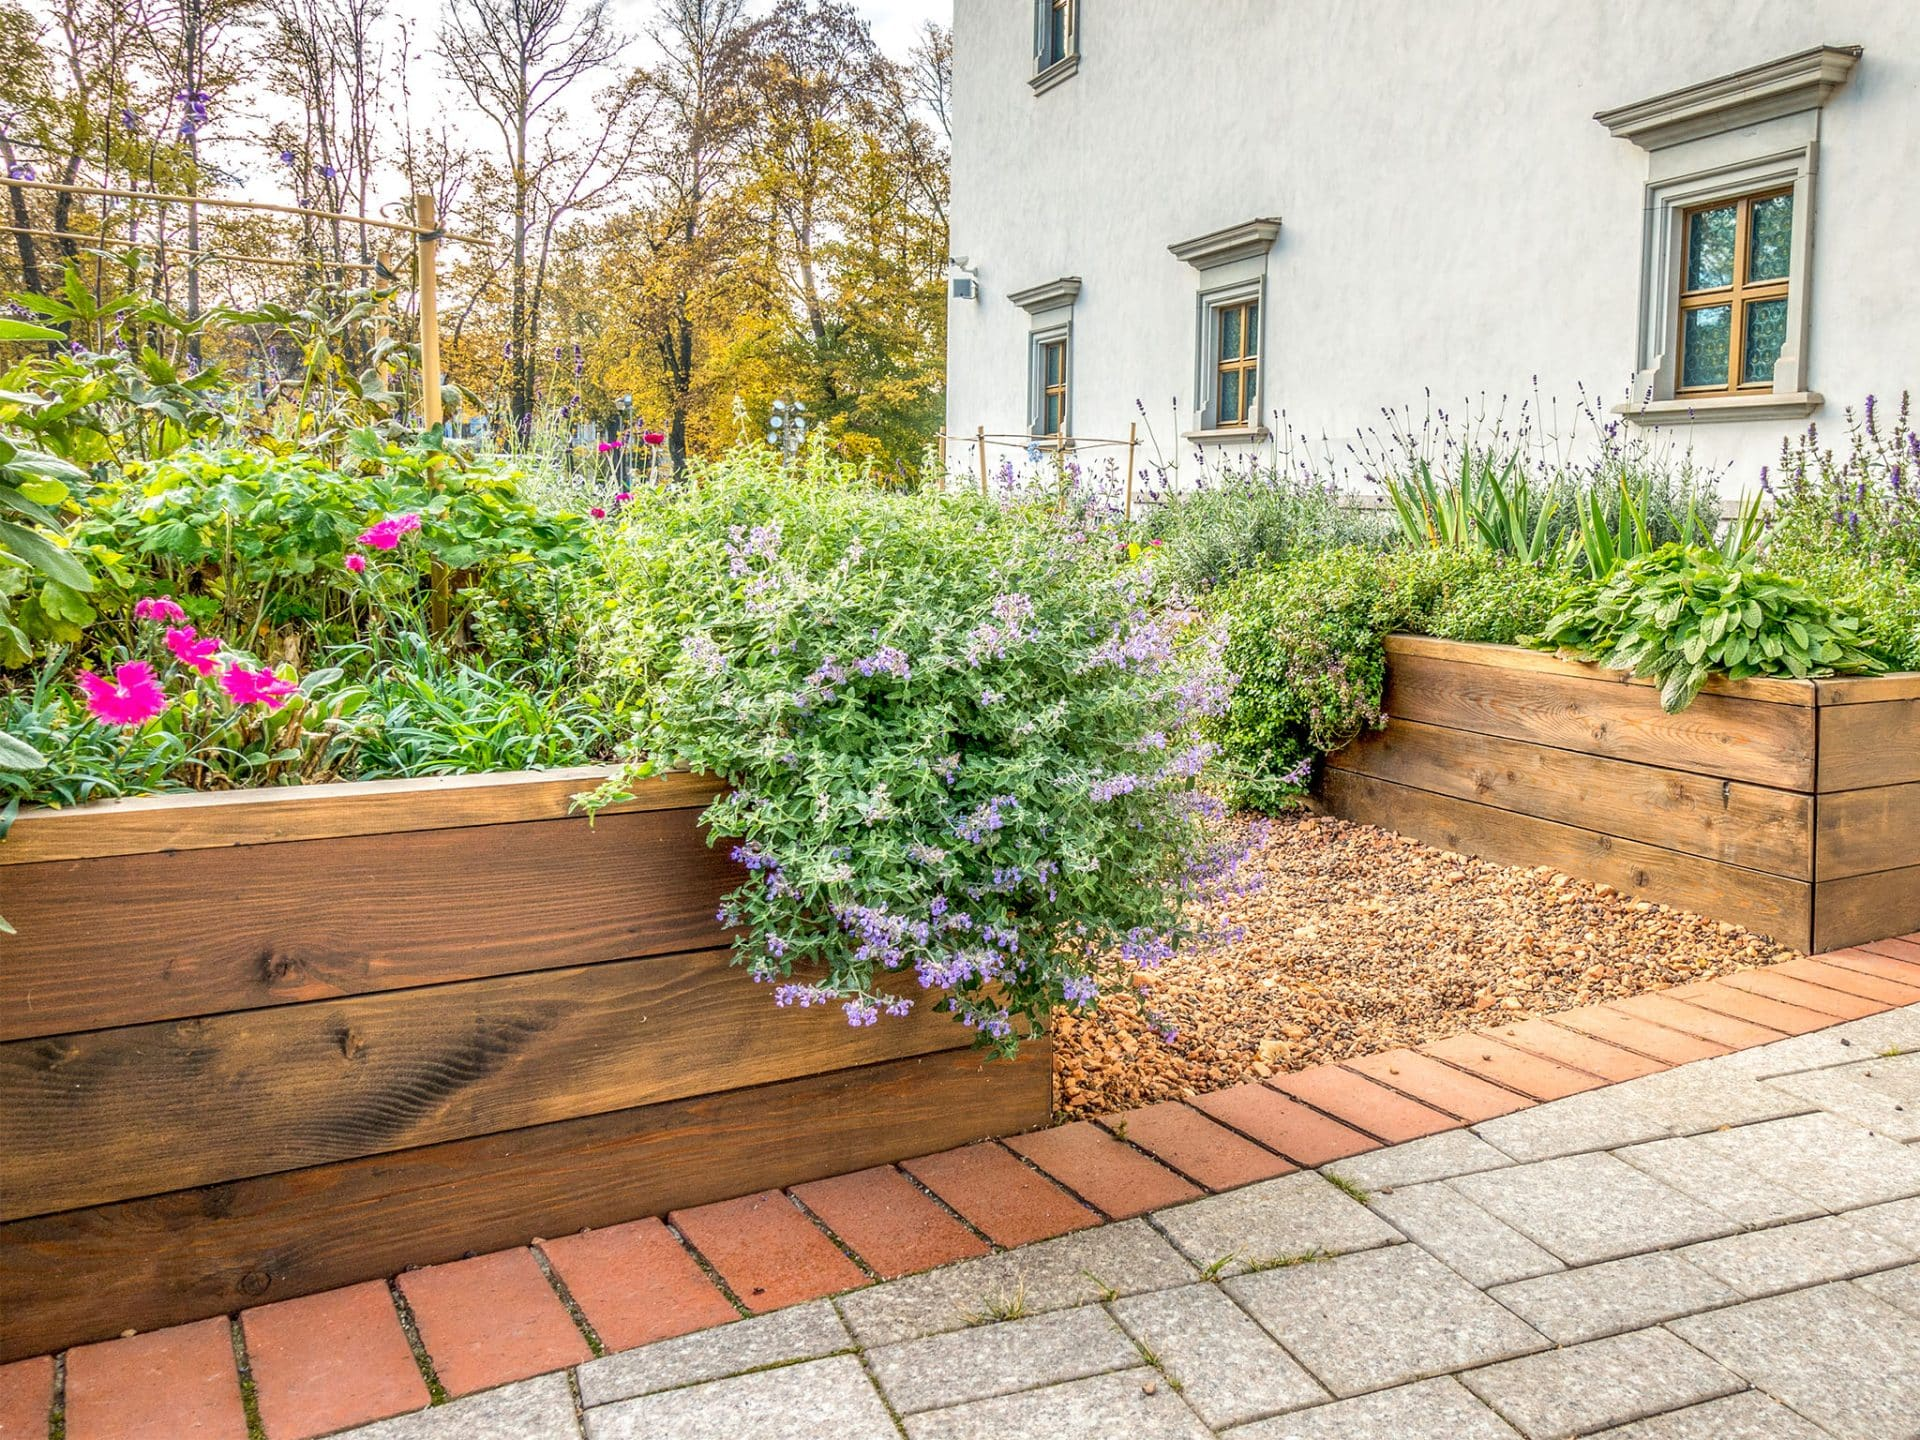 Gartenkonzept allein aus Hochbeeten direkt am Haus © Vejaa - depositphotos.com